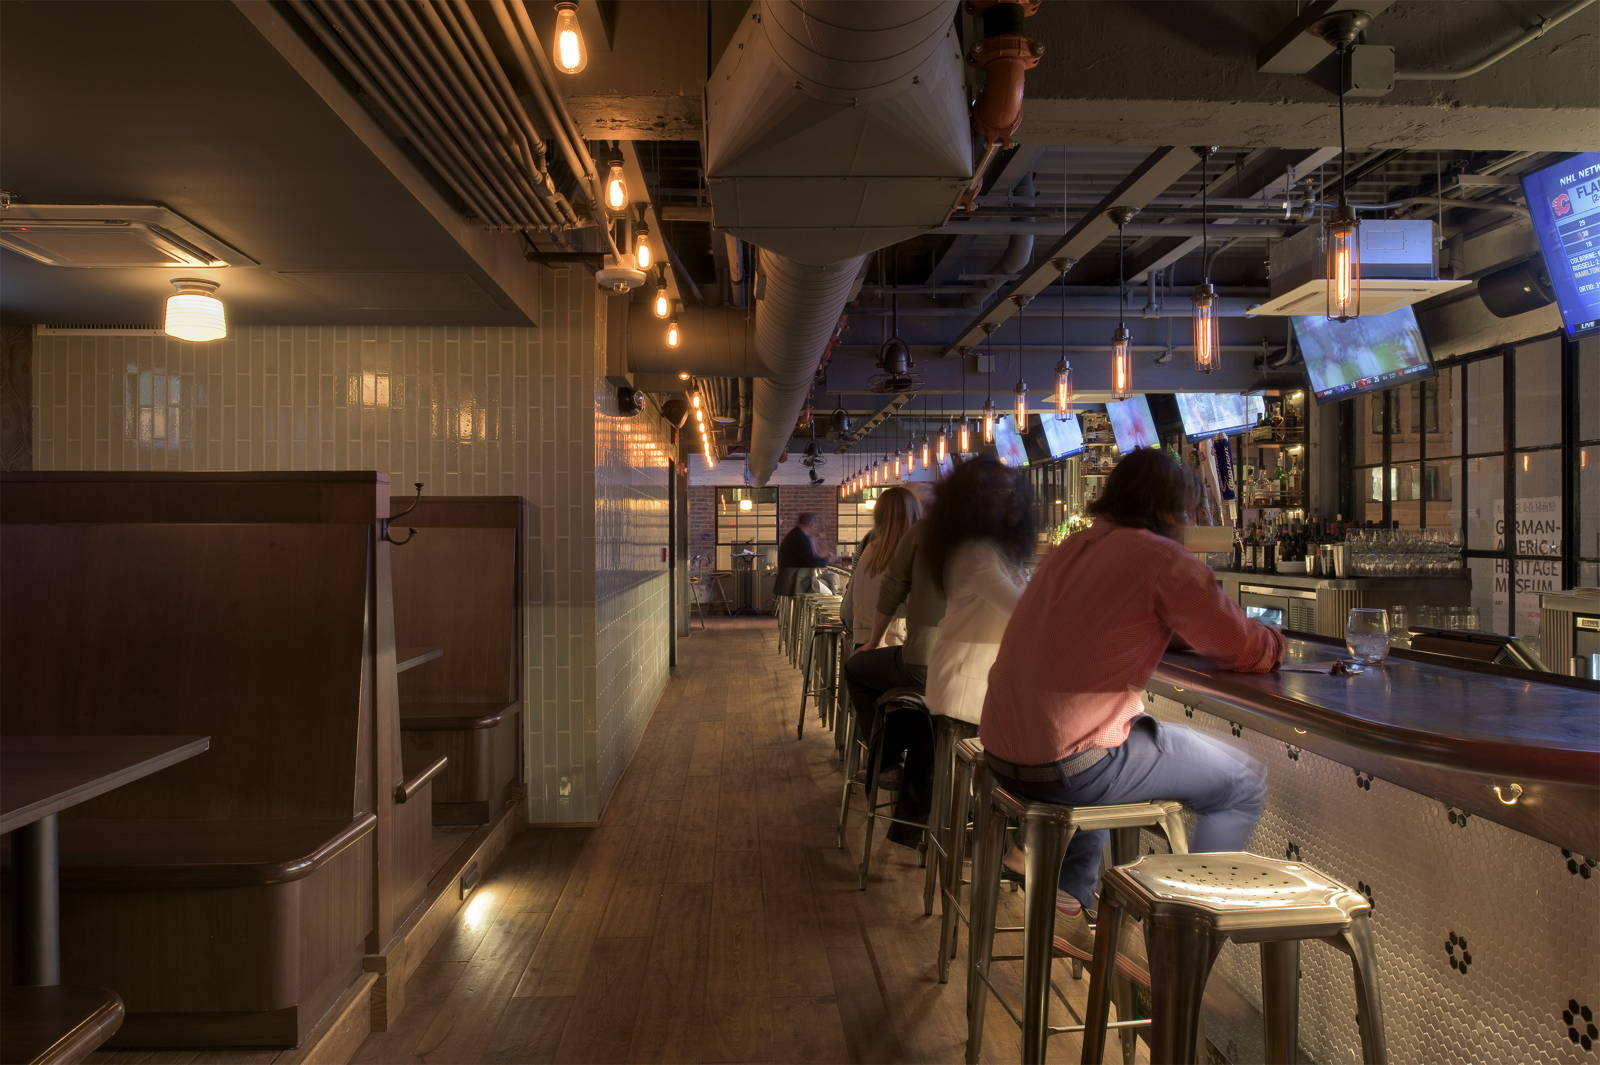 Bar Deco restaurant designed by CORE Architecture + Design